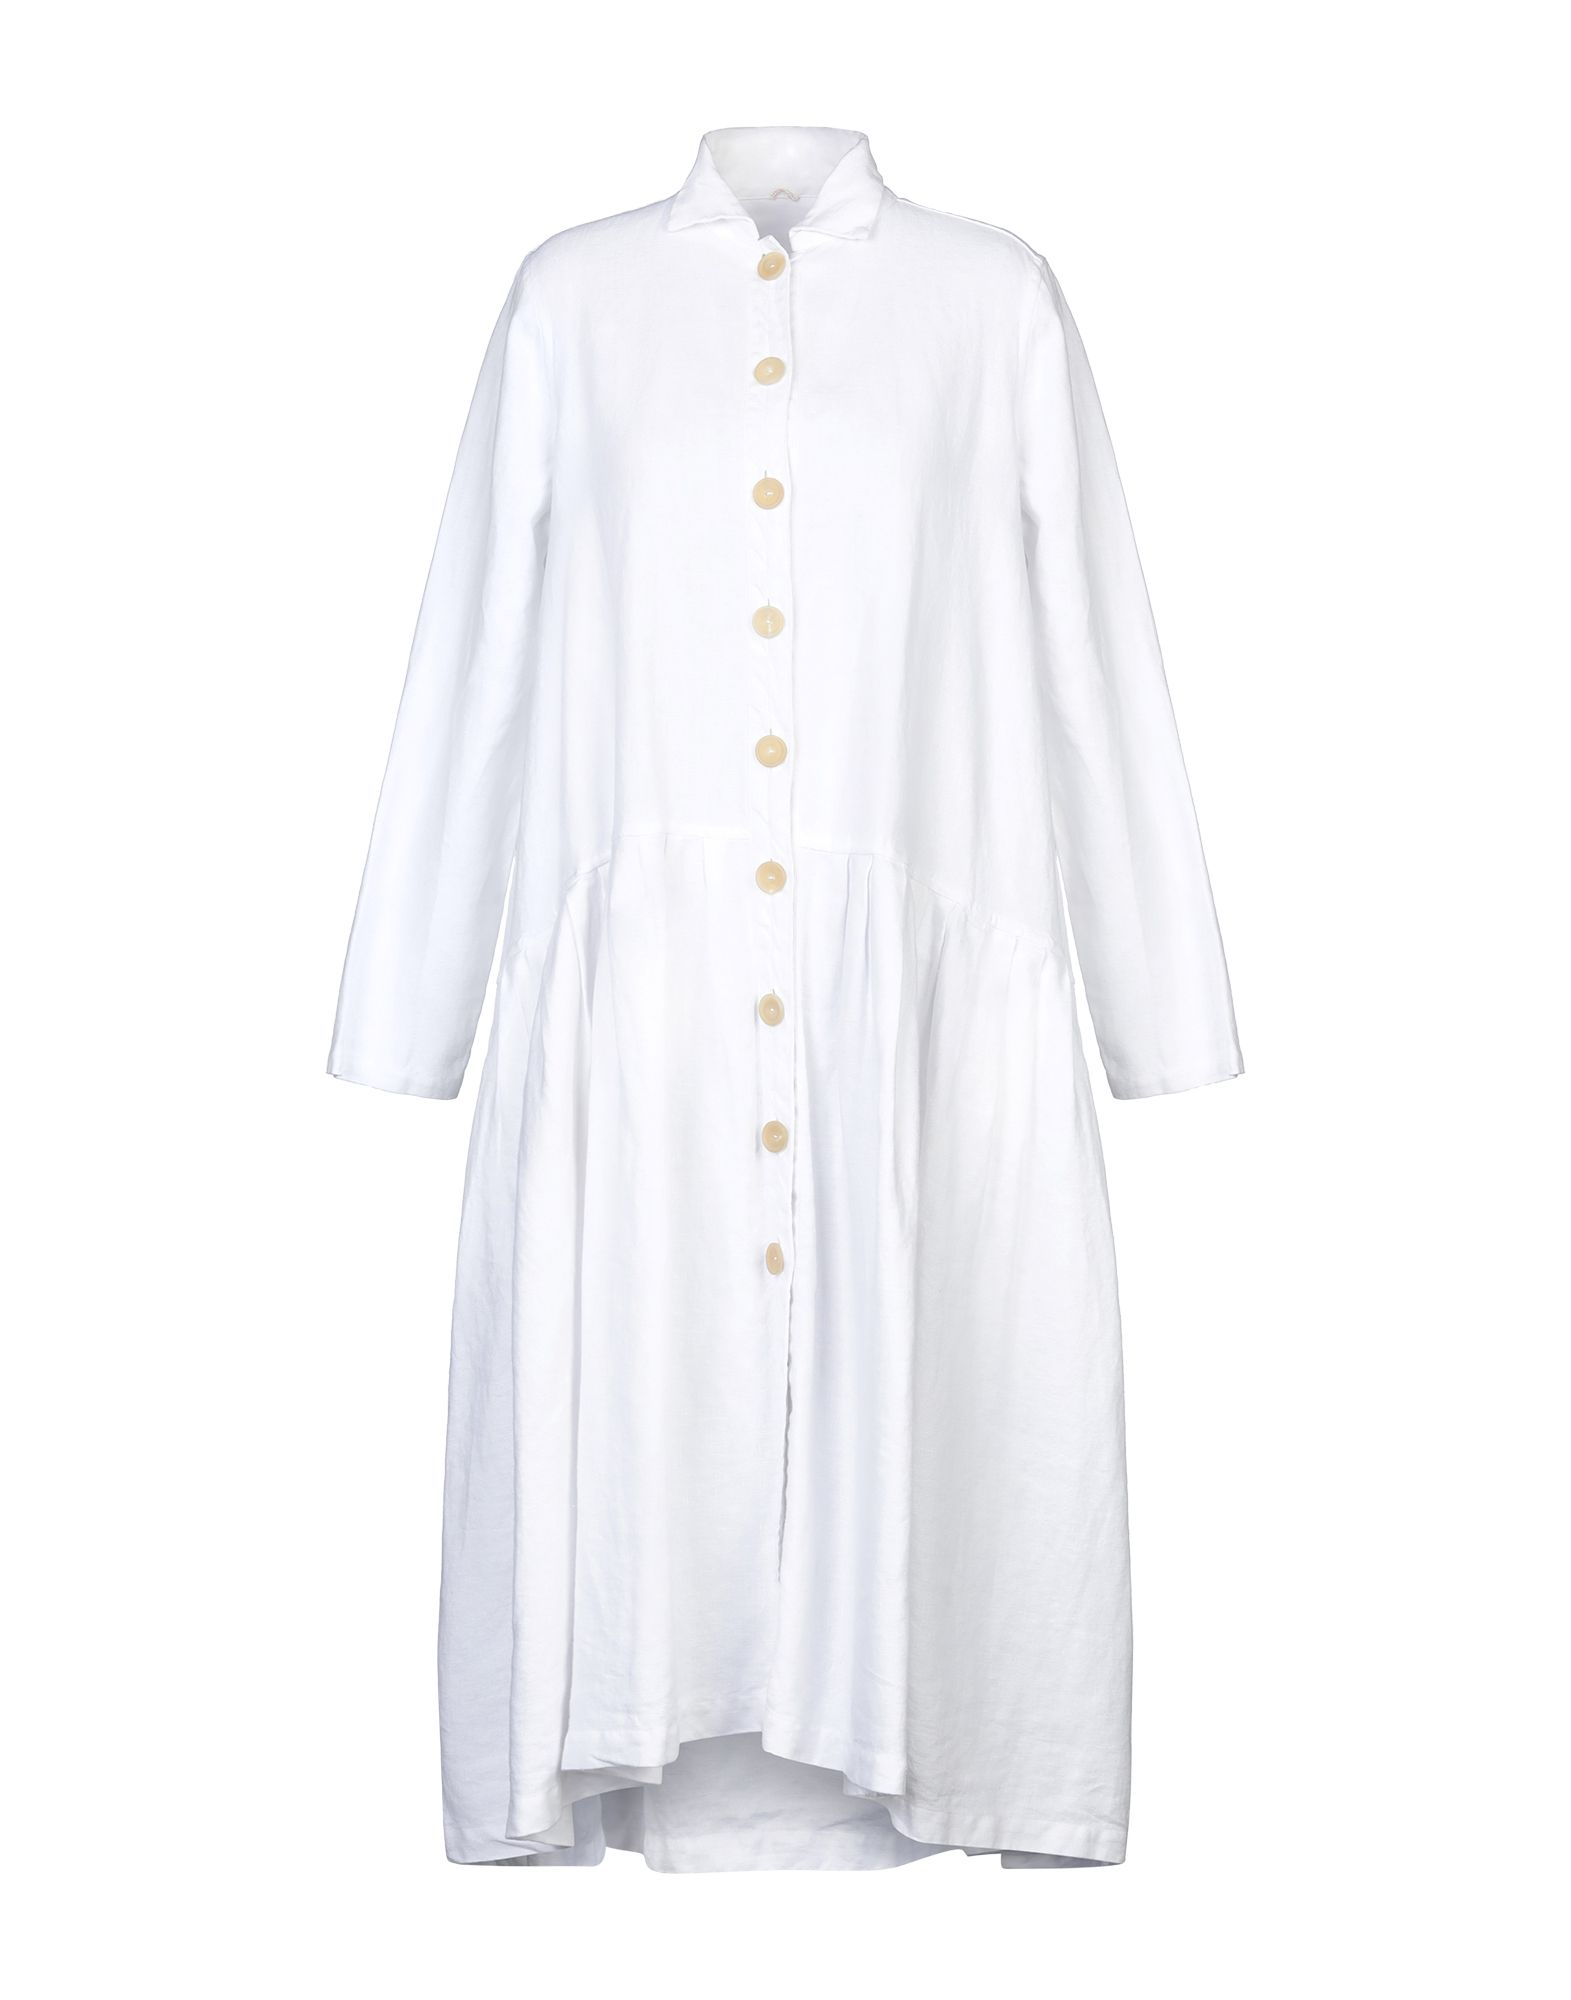 RICORRROBE Платье длиной 3/4